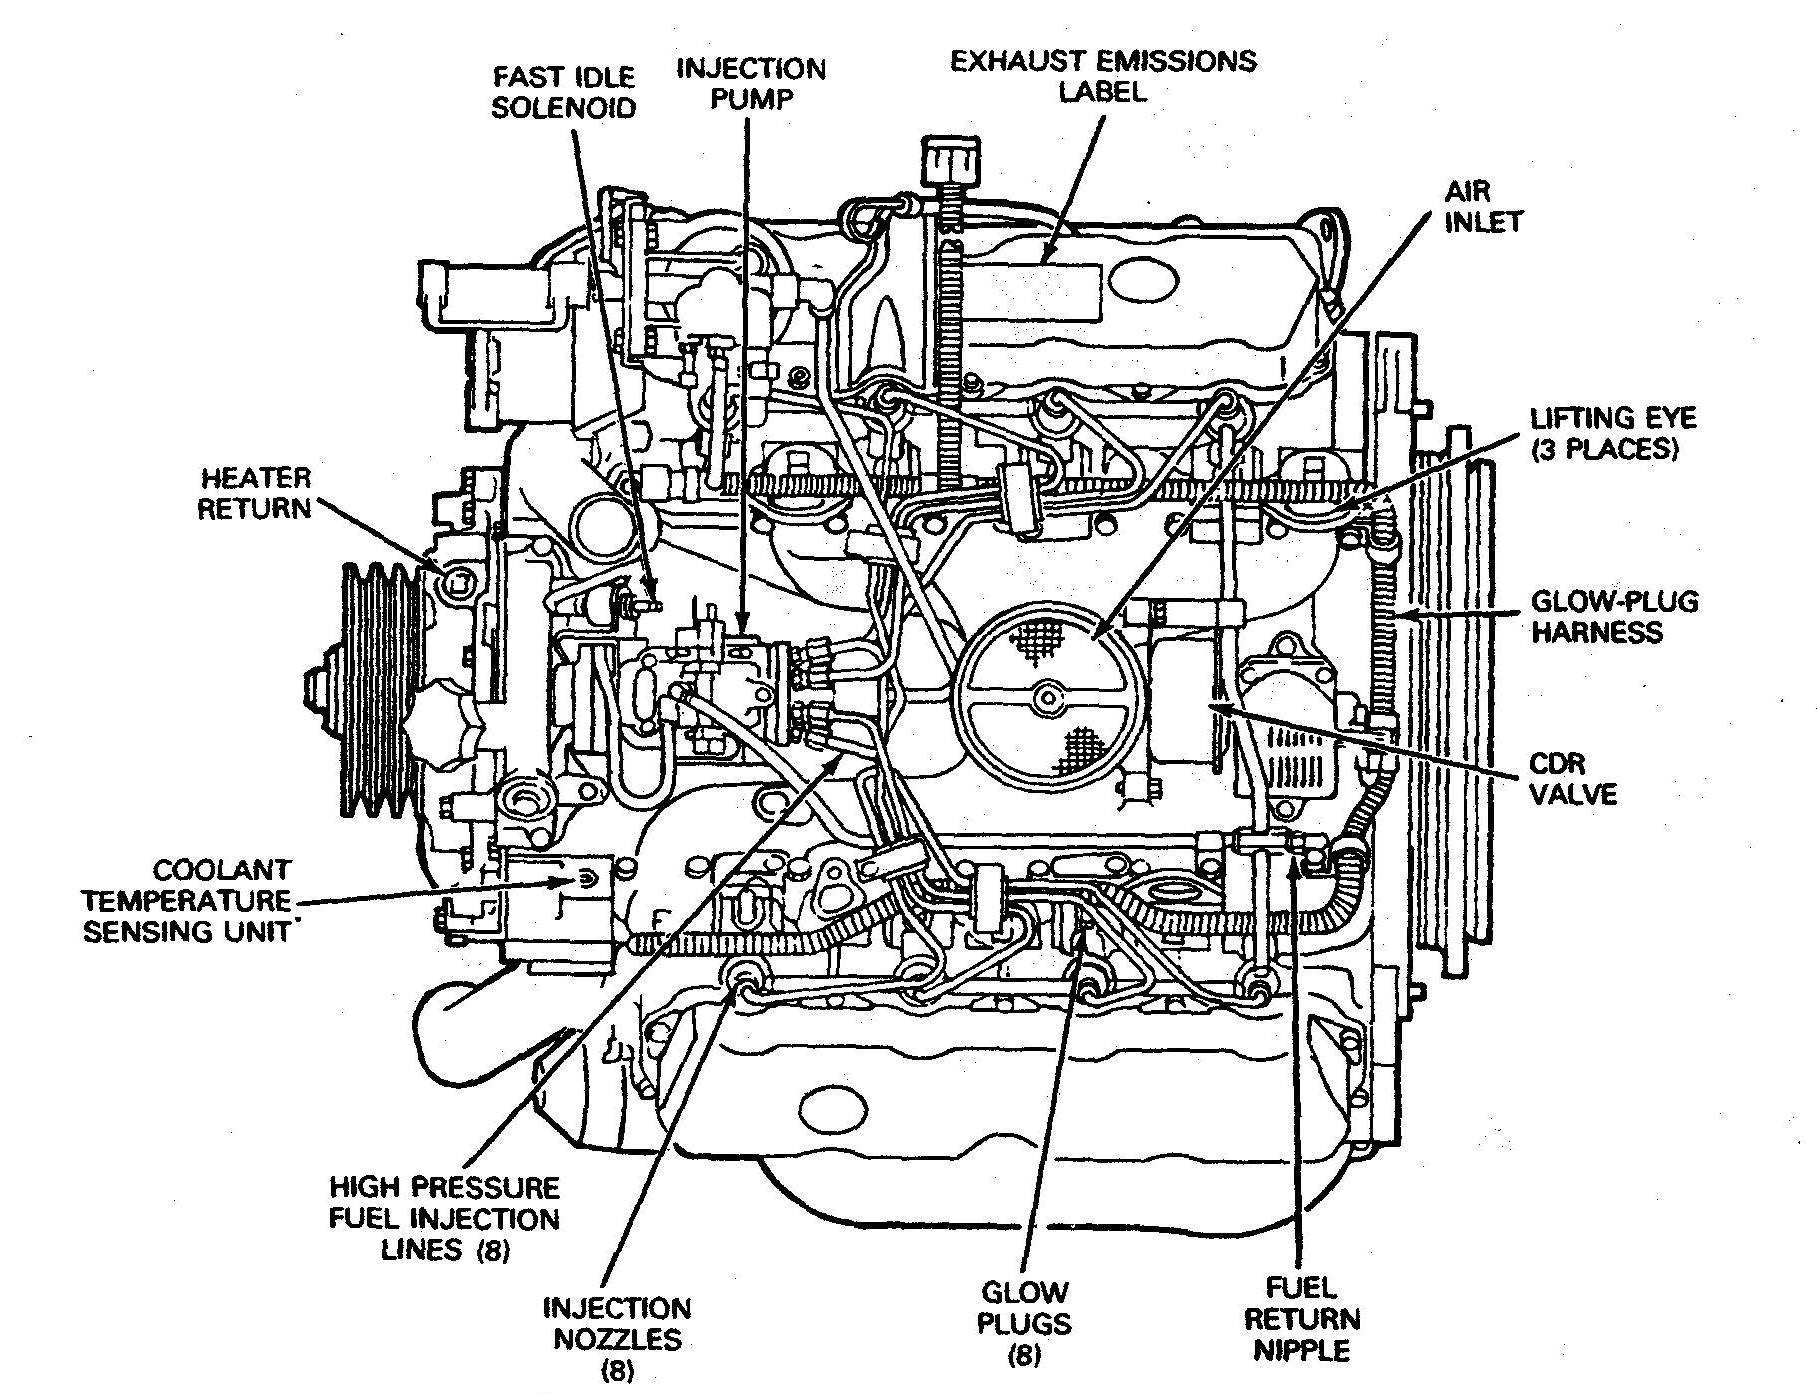 5.9 Cummins Diesel Engine Diagram Diagram] 3 3 Engine Diagram Full Version Hd Quality Engine Of 5.9 Cummins Diesel Engine Diagram